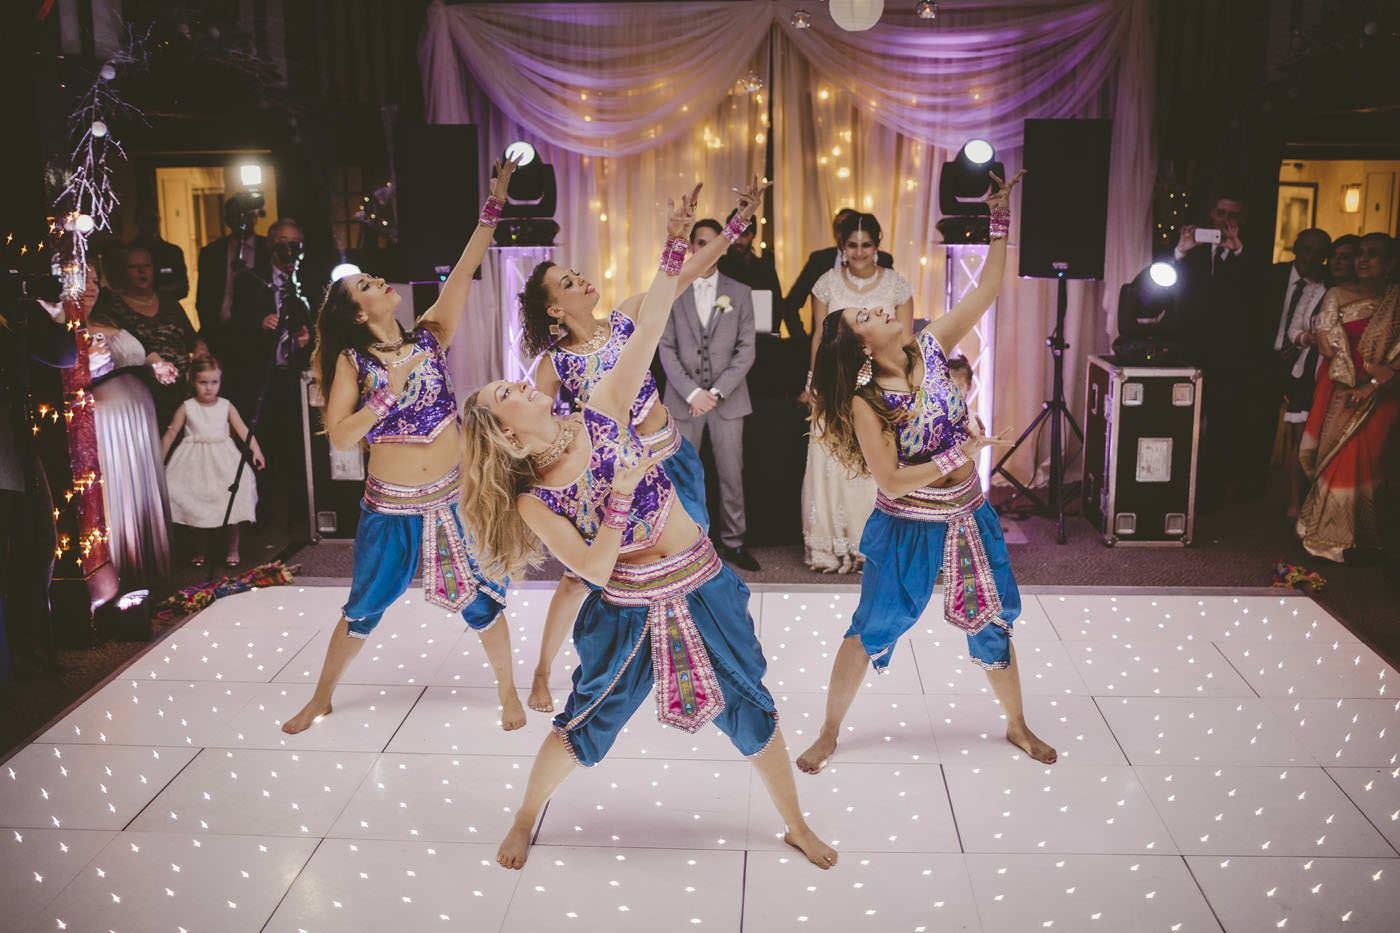 edmundjasveen burford bridge hotel wedding photographer 0118